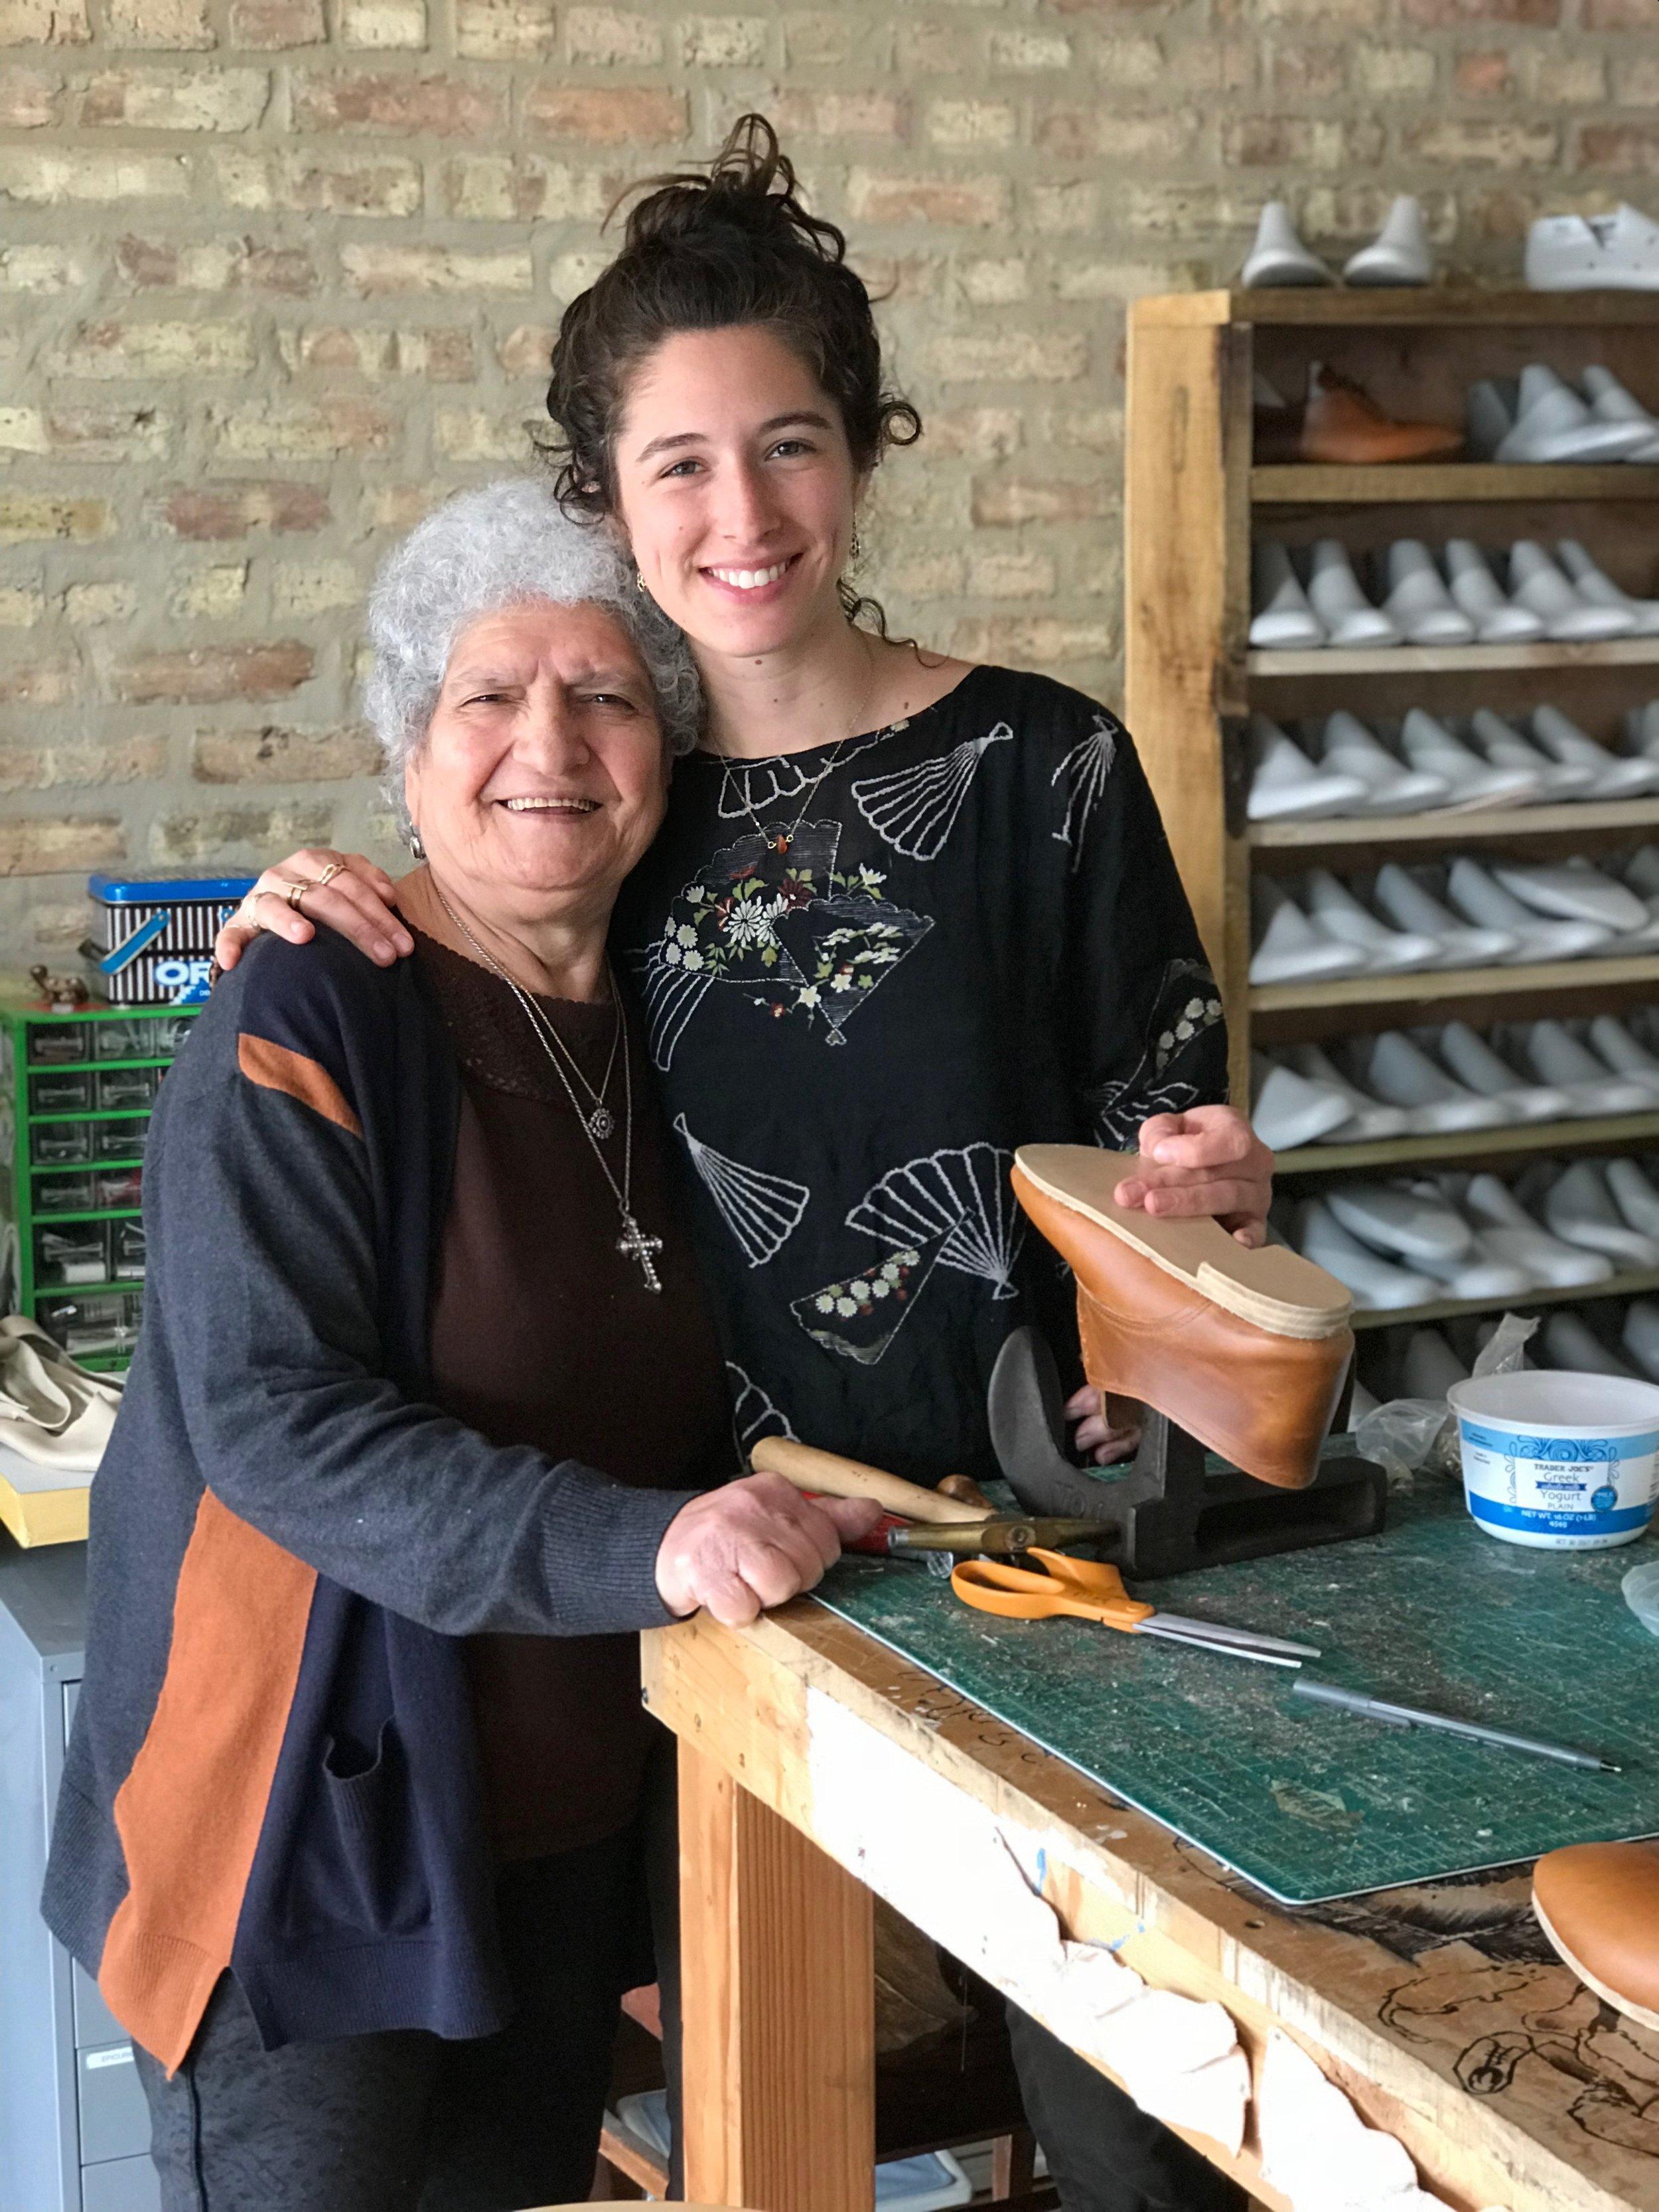 Photo: Showing my Grandma, a lifelong seamstress, how I make shoes in my studio.